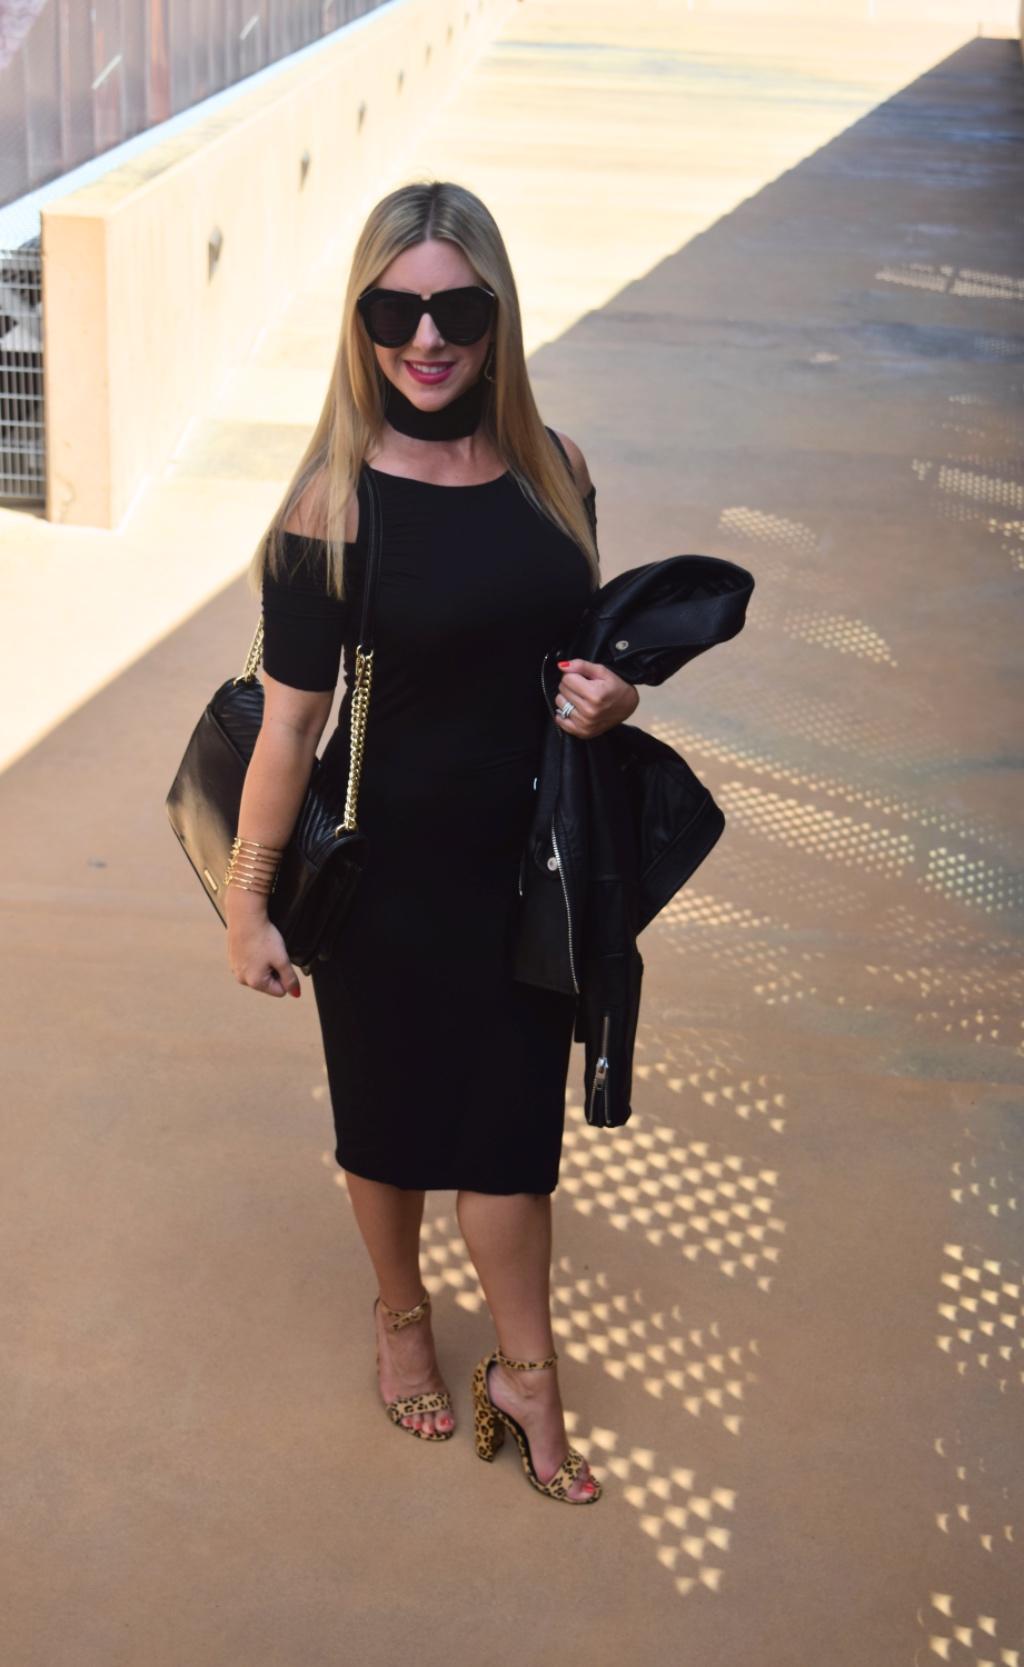 Cold Shoulder Dress | Dallas Fashion Blog by Nicole Kirk